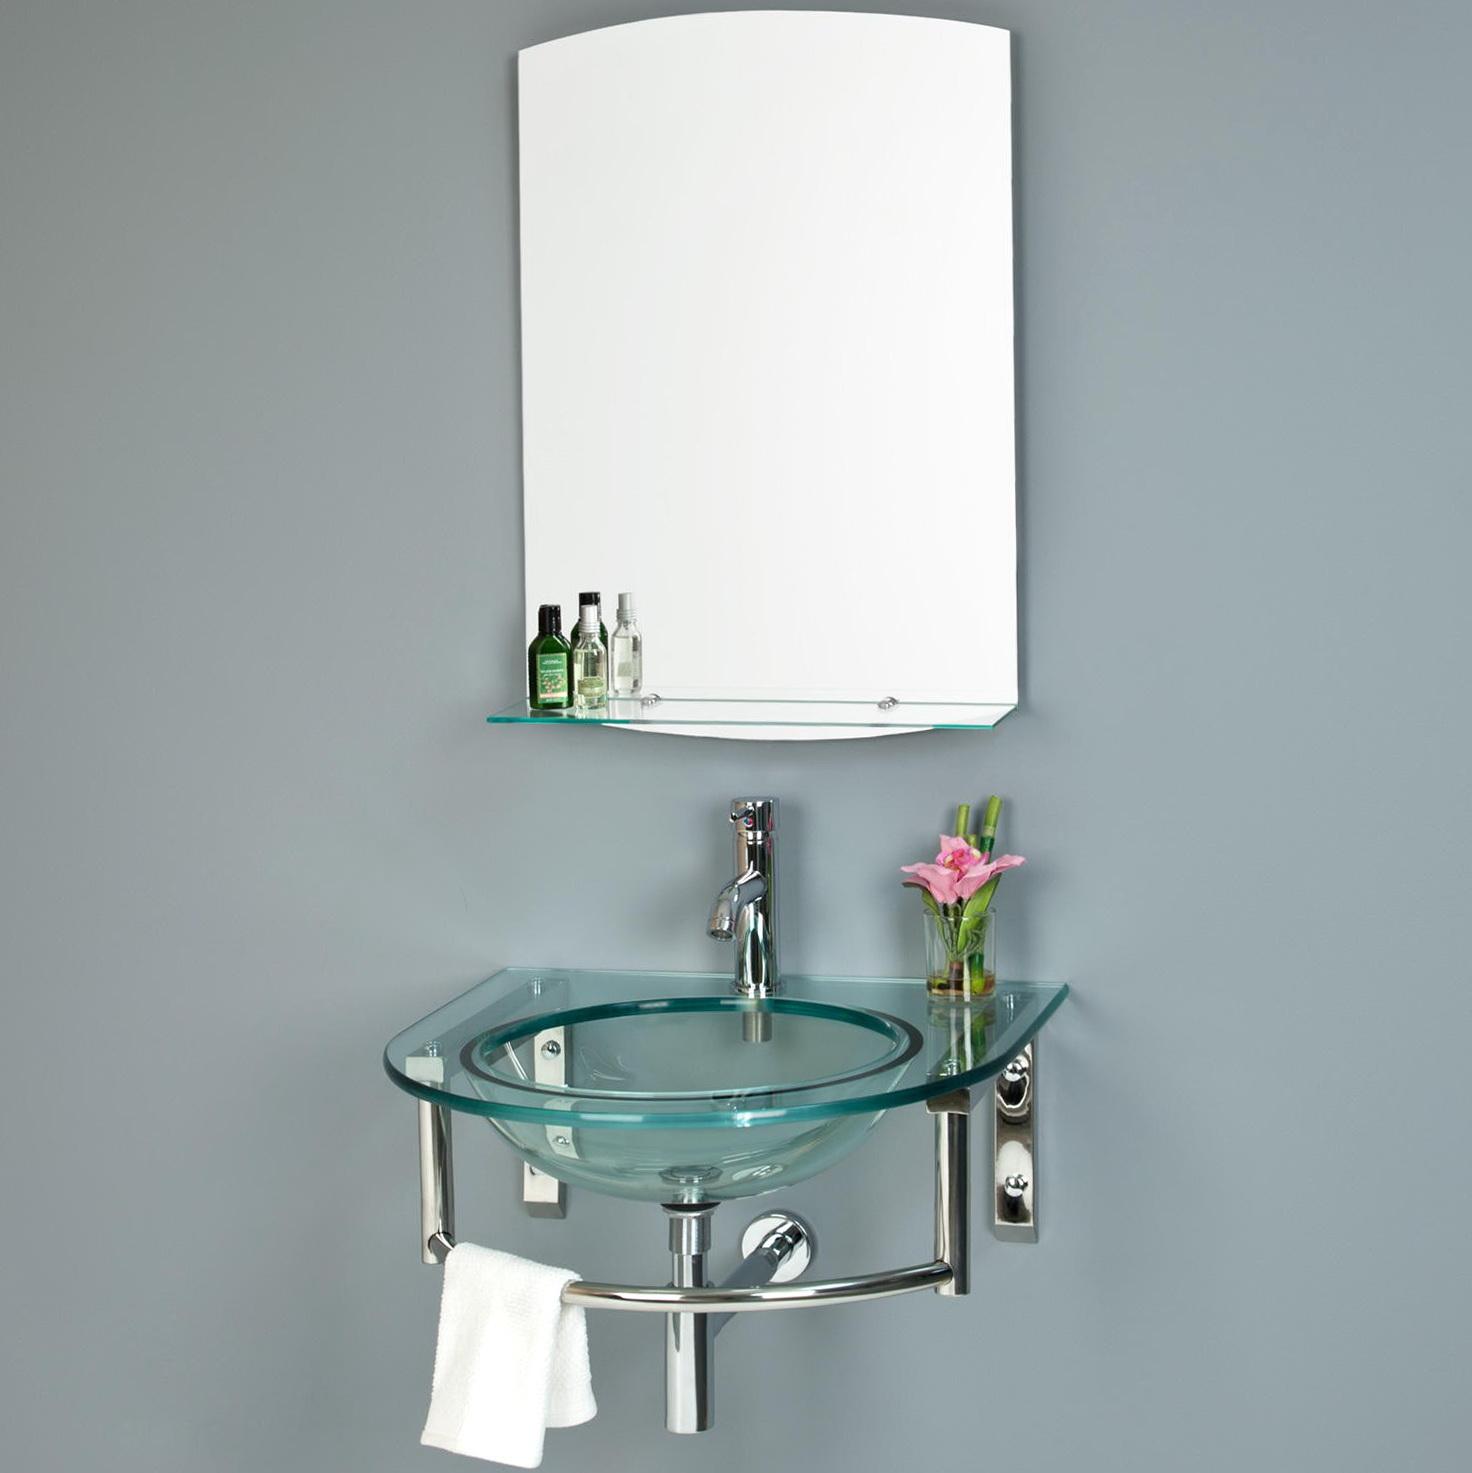 Mounting Bathroom Mirror: Bathroom Mirror Mounting Hardware